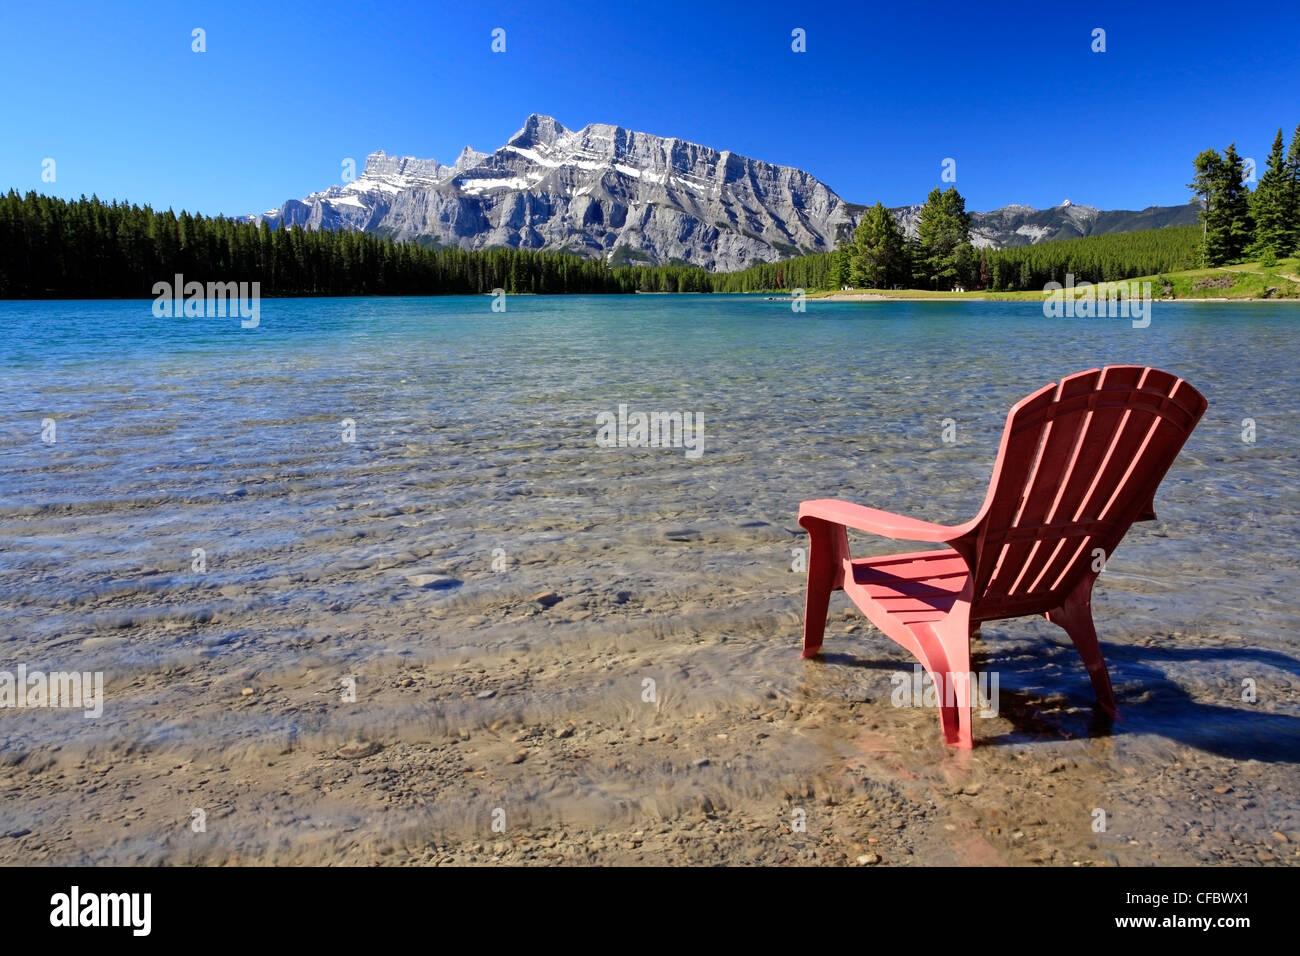 Deck chair at Two Jack Lake, Banff National Park, Alberta, Canada Stock Photo